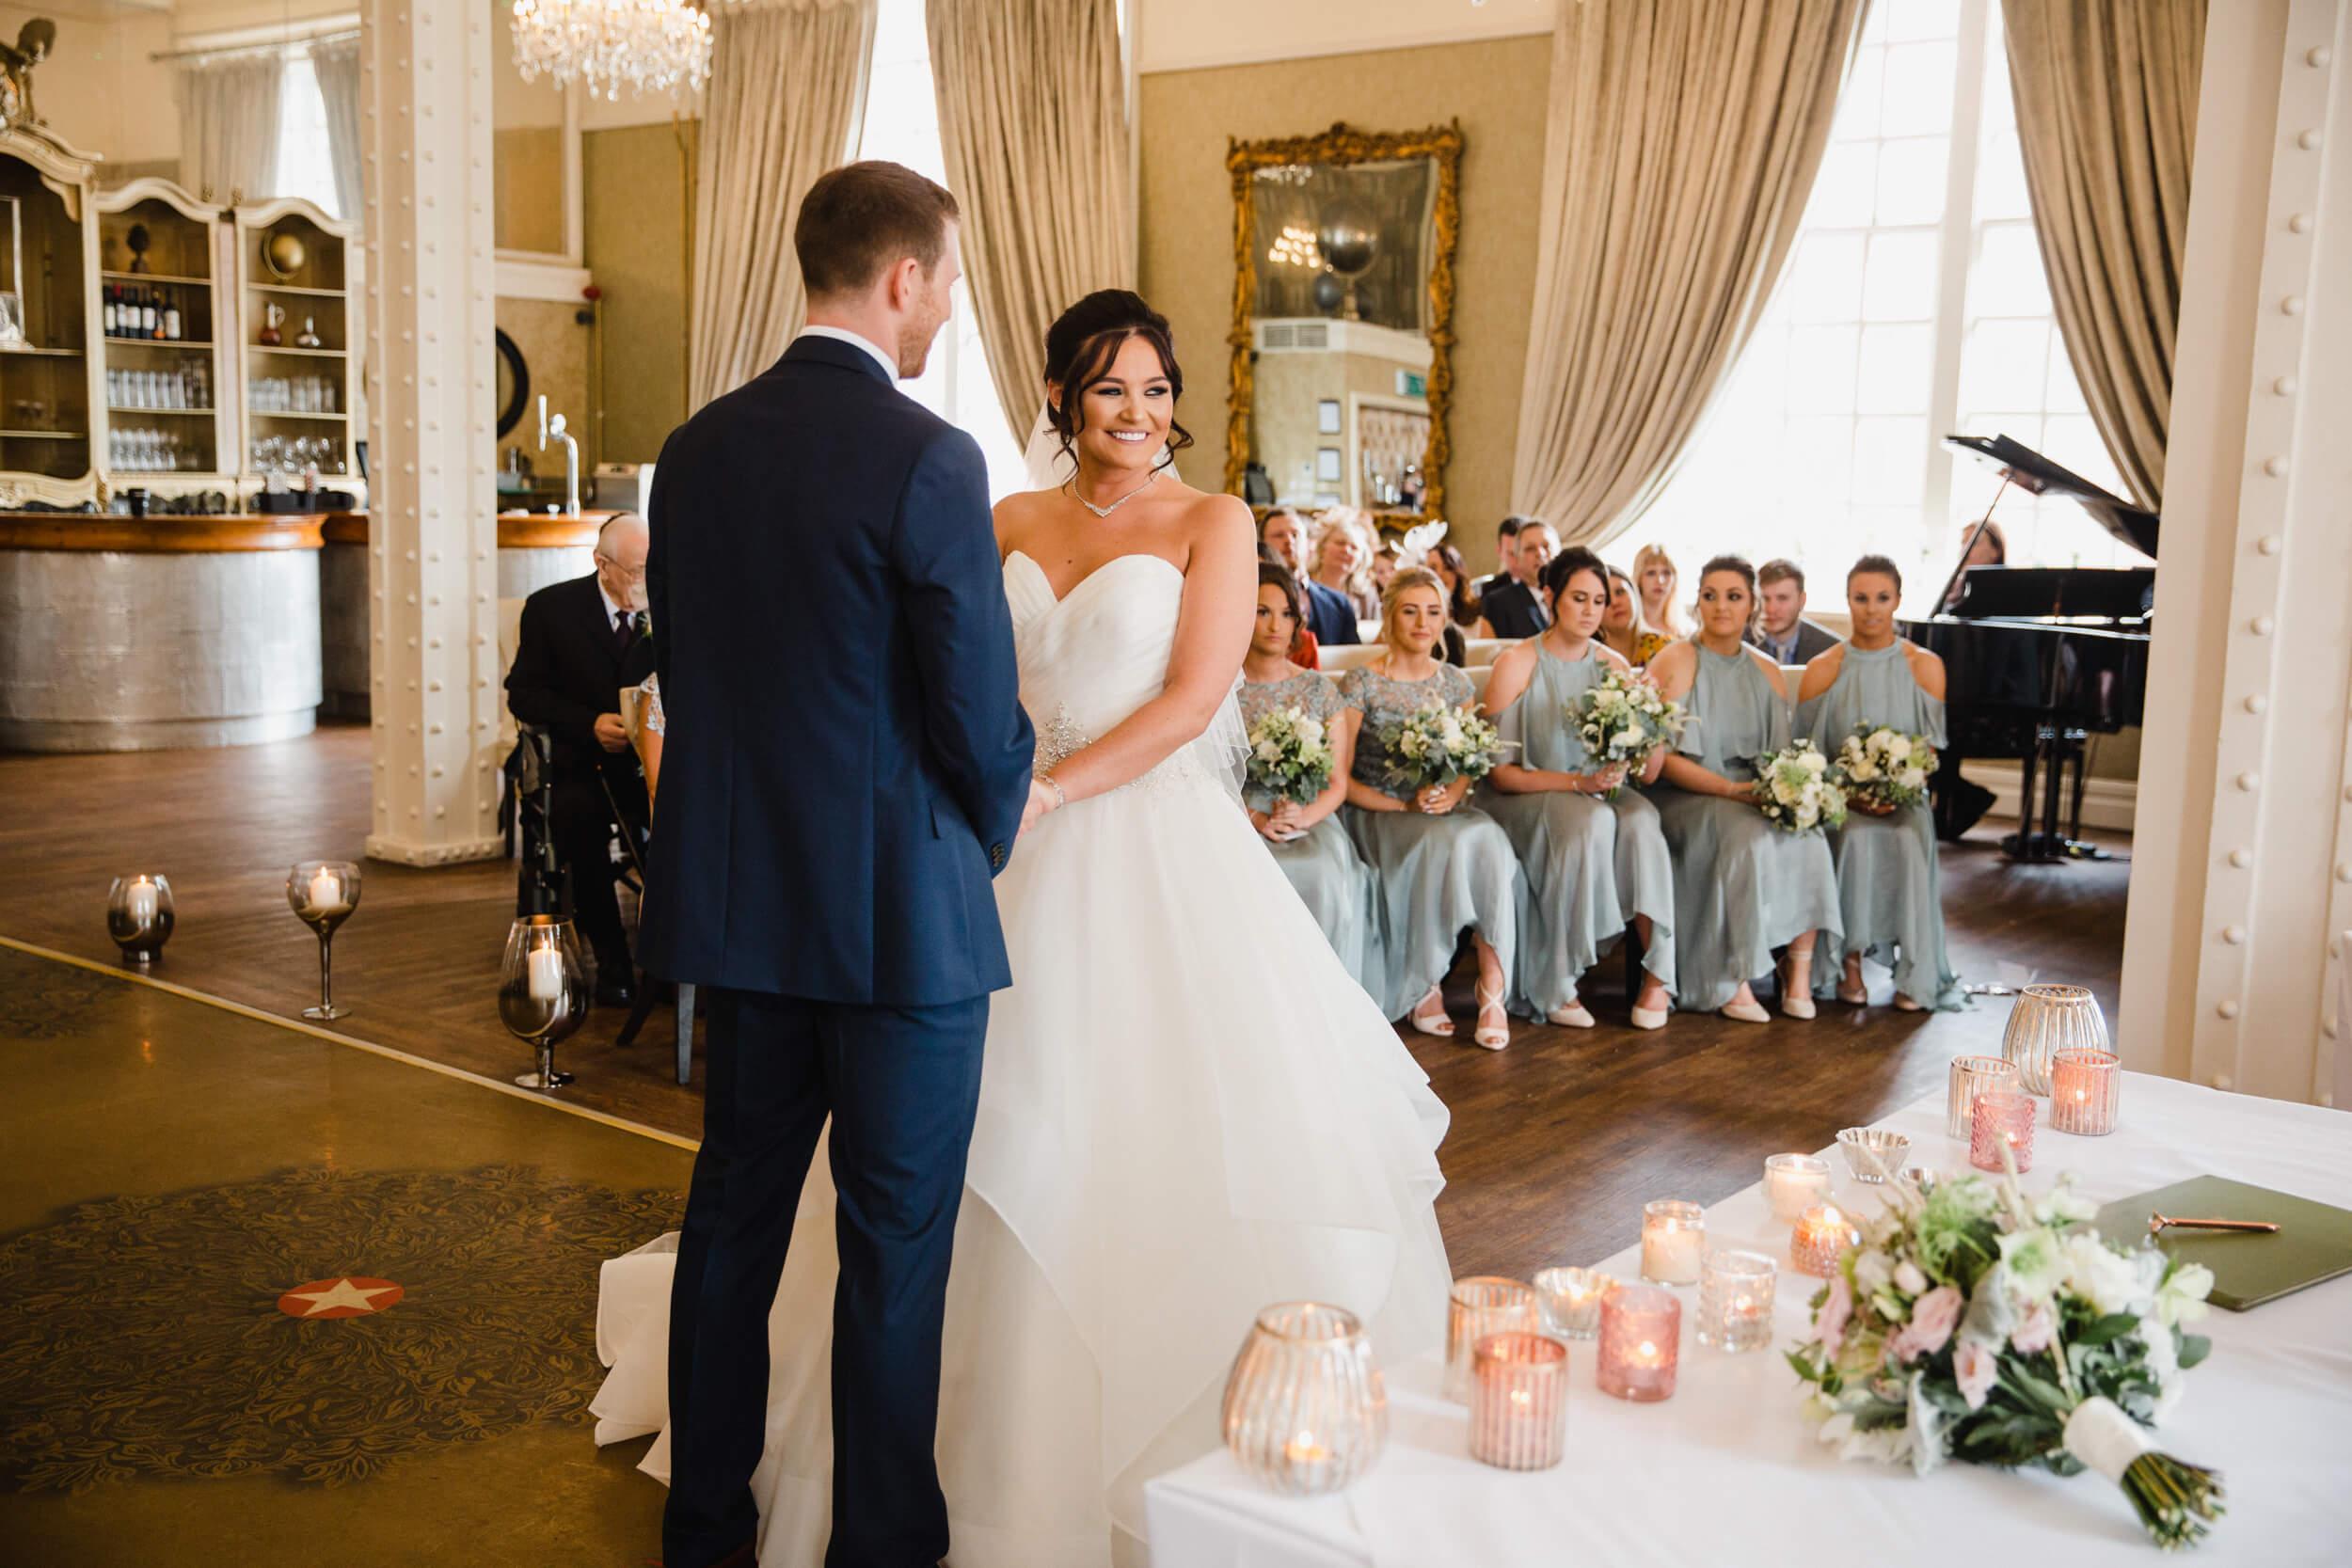 30_James_Street_Hotel_Wedding_Venue_021.jpg